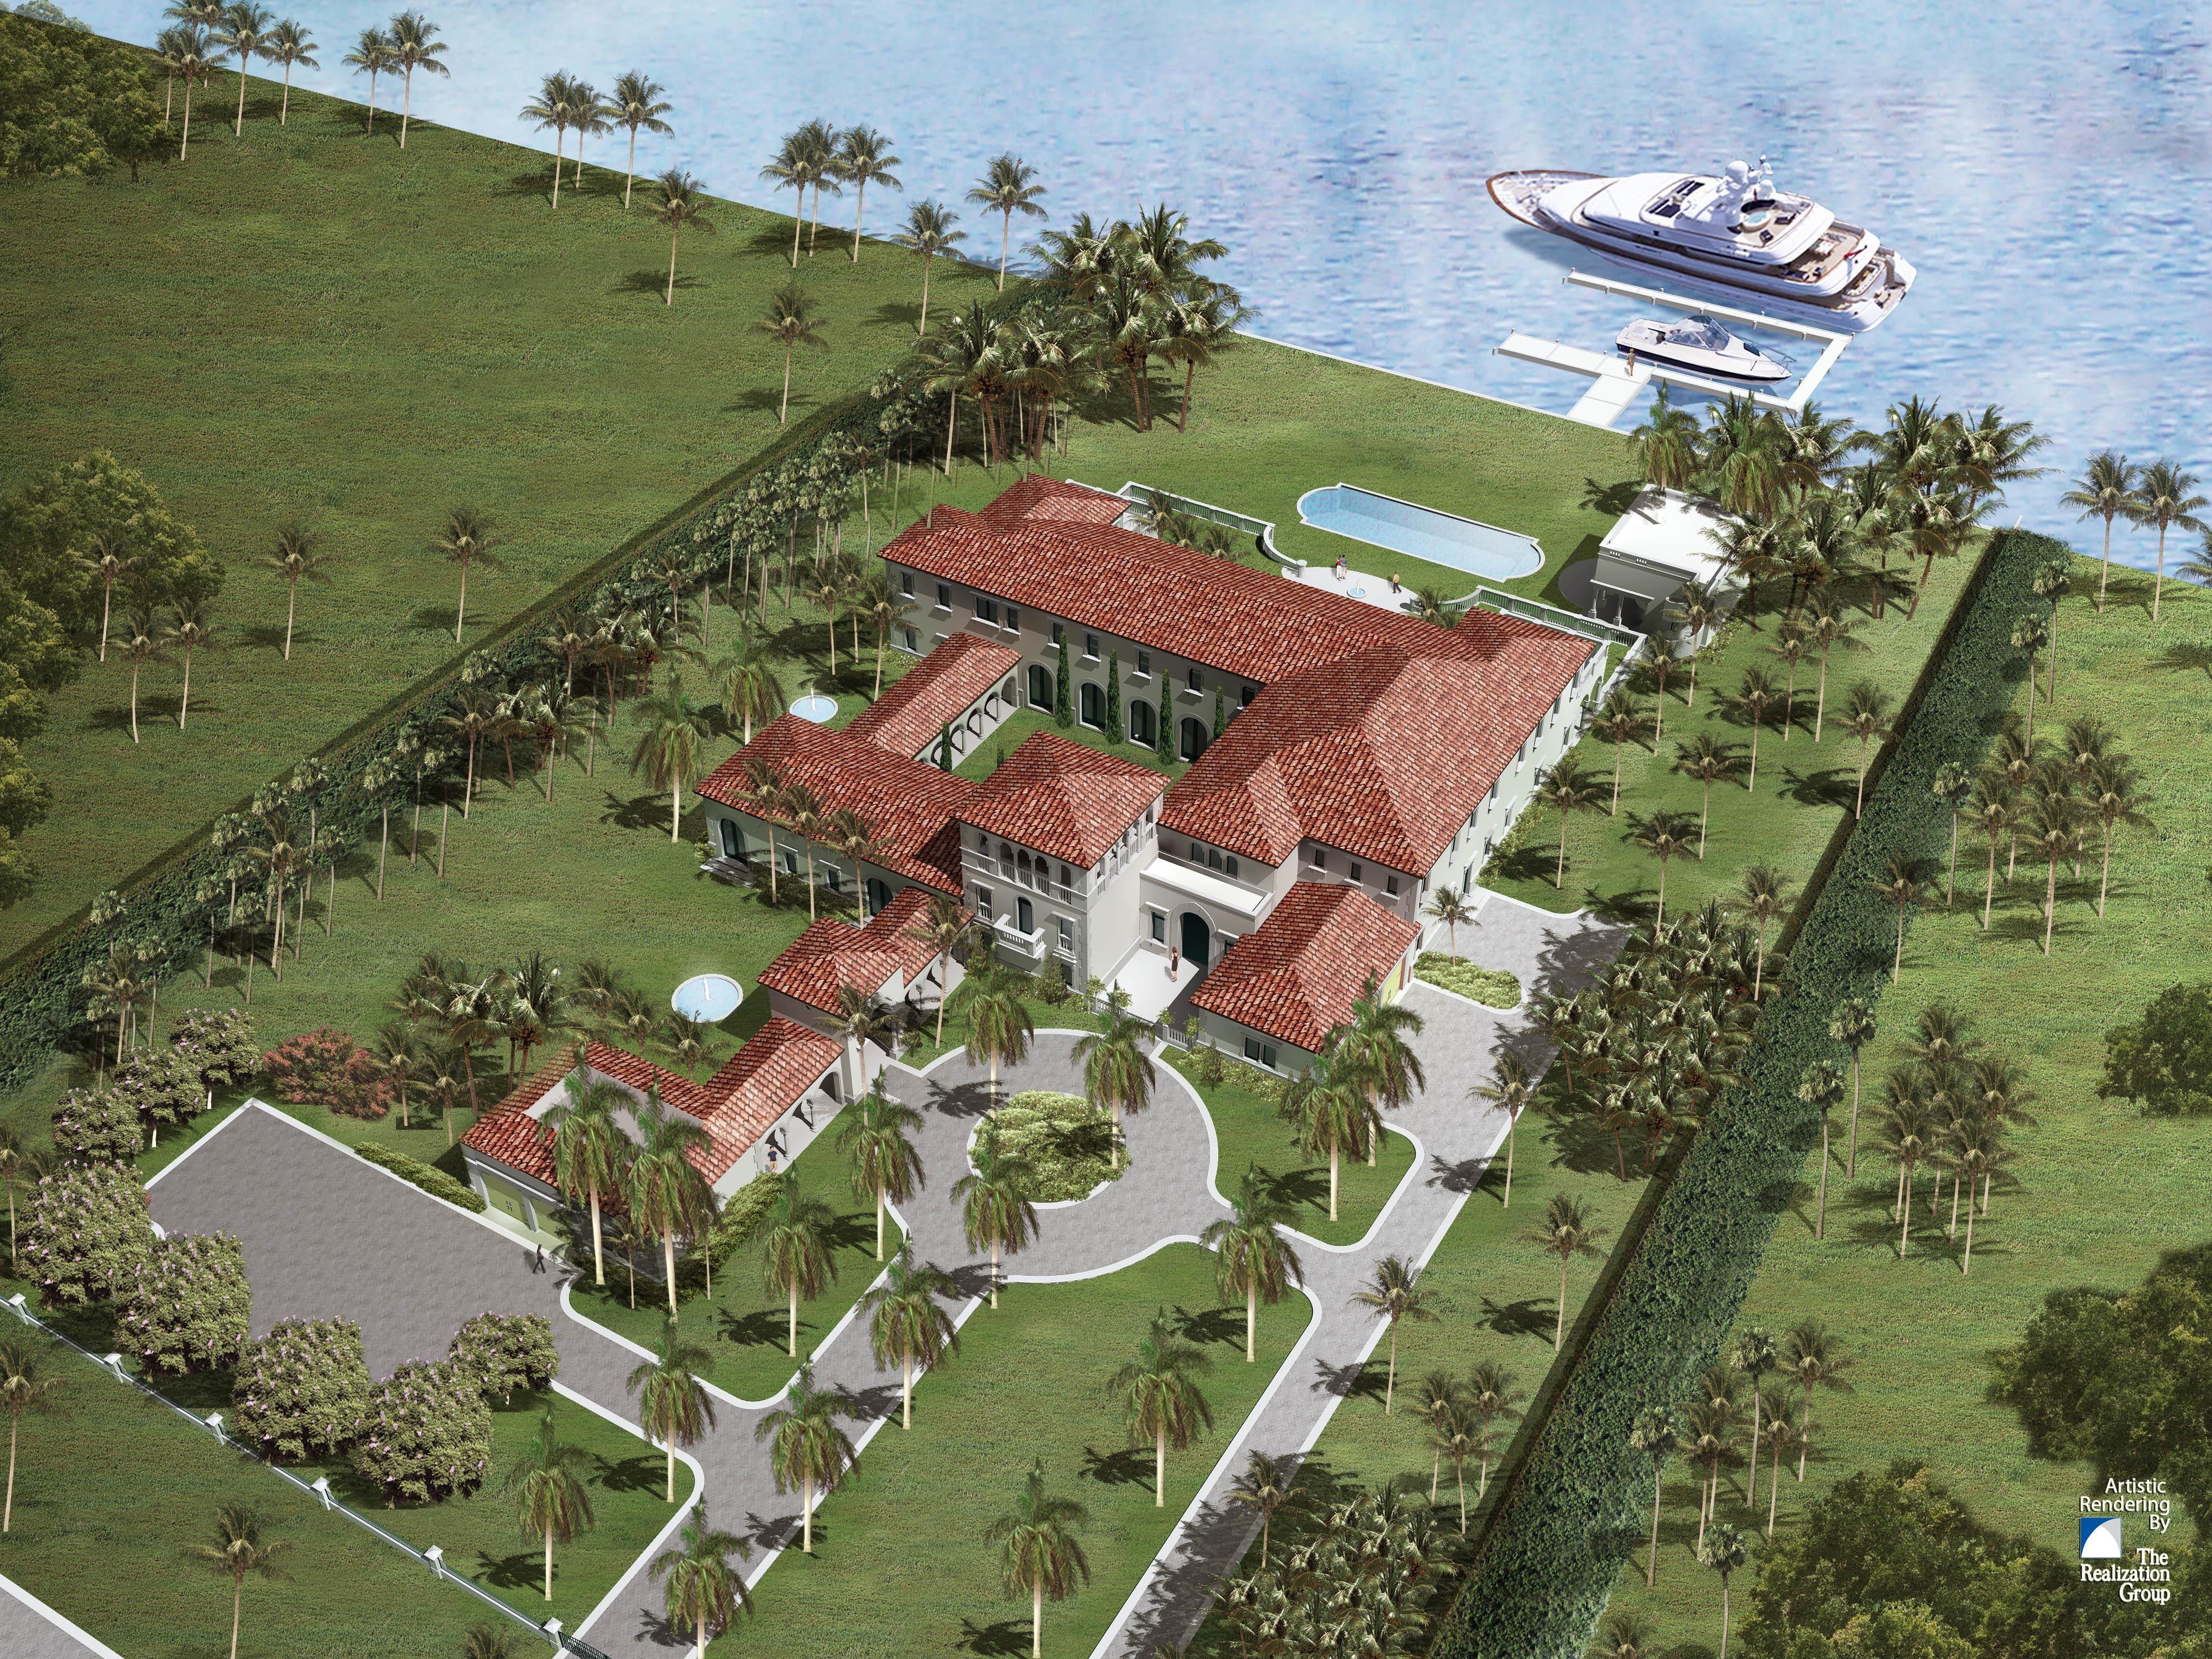 4-5-6-7 Indian Creek Island Rd, Indian Creek Village, FL 33154 ...